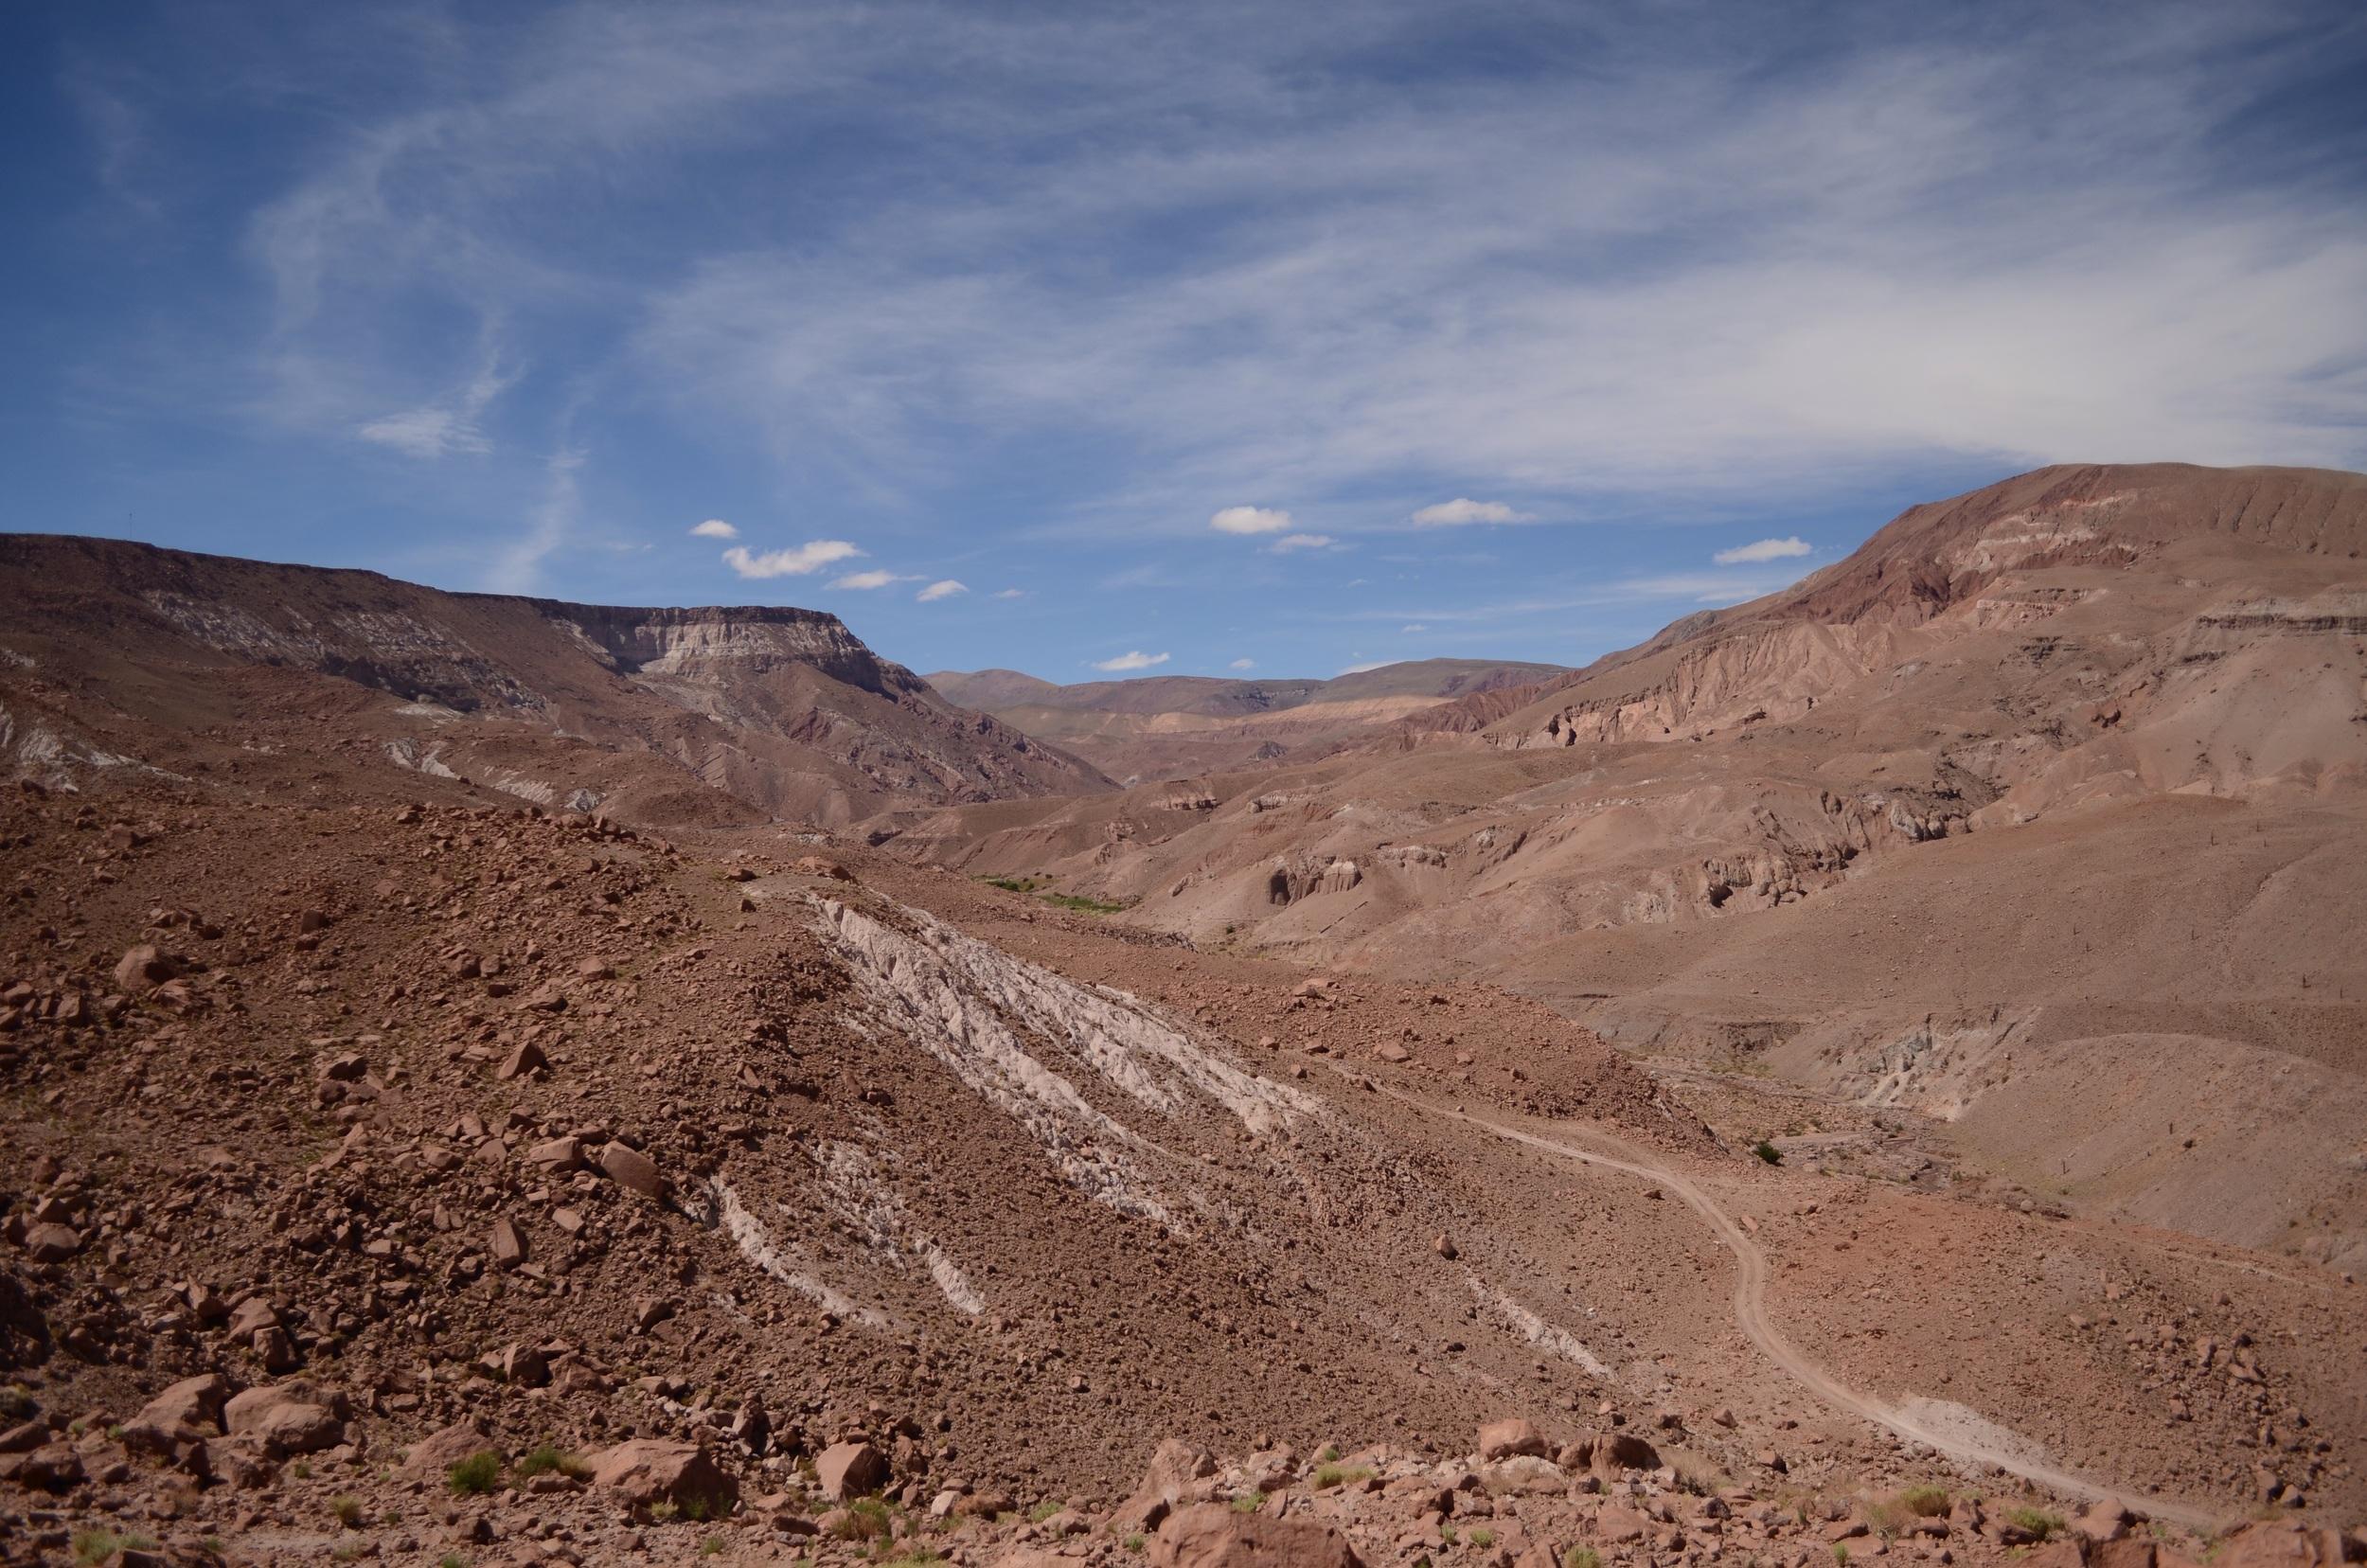 Vista en route to San Pedro // 16 april 2015